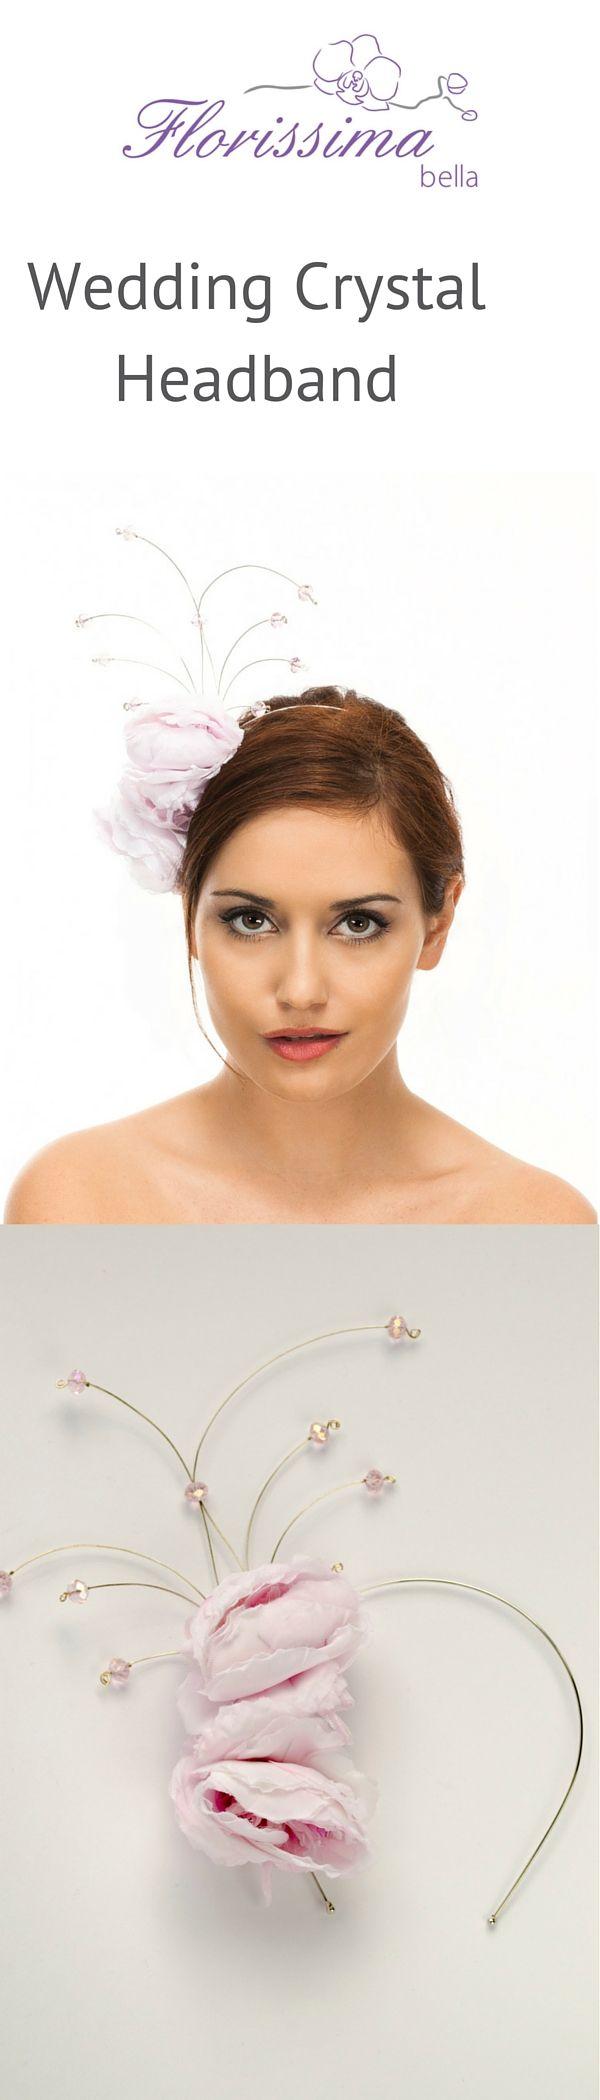 Trendy bridal headpiece - Wedding Headband With Crystals